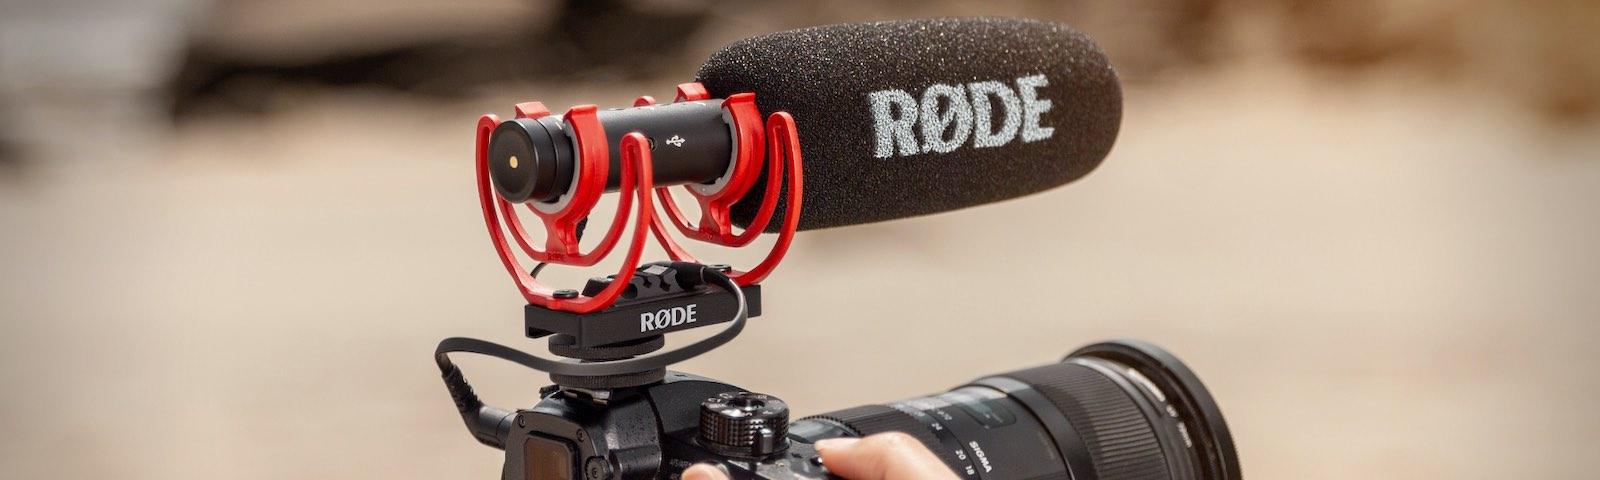 Rºde VideoMic Pro